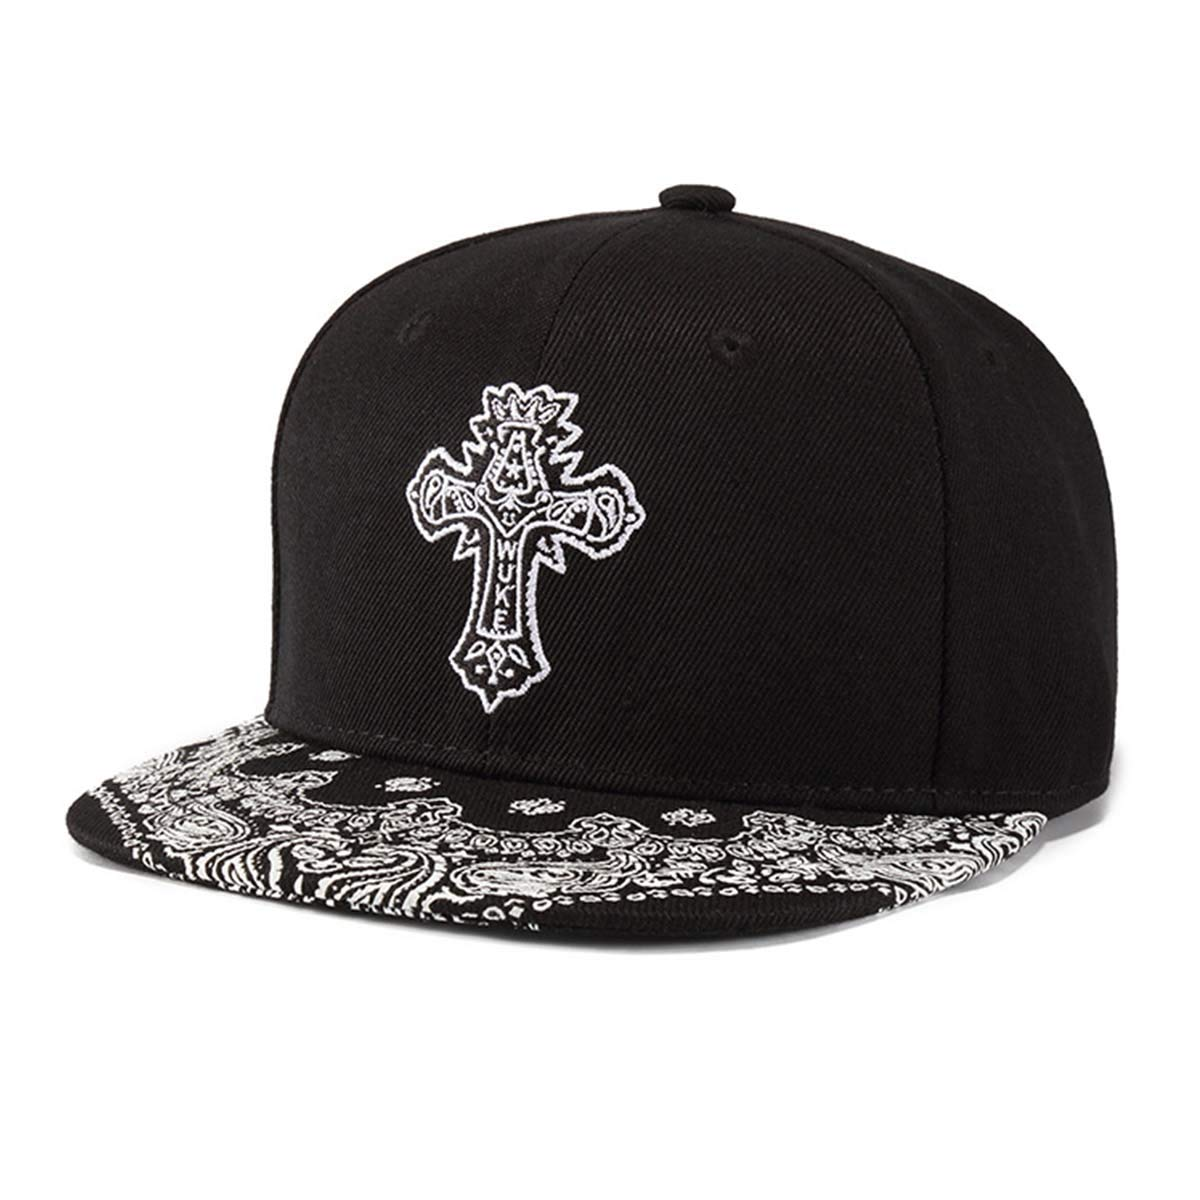 3de226f00d7ab King Star Men Solid Flat Bill Hip Hop Snapback Baseball Cap Black-Cross at  Amazon Men's Clothing store: